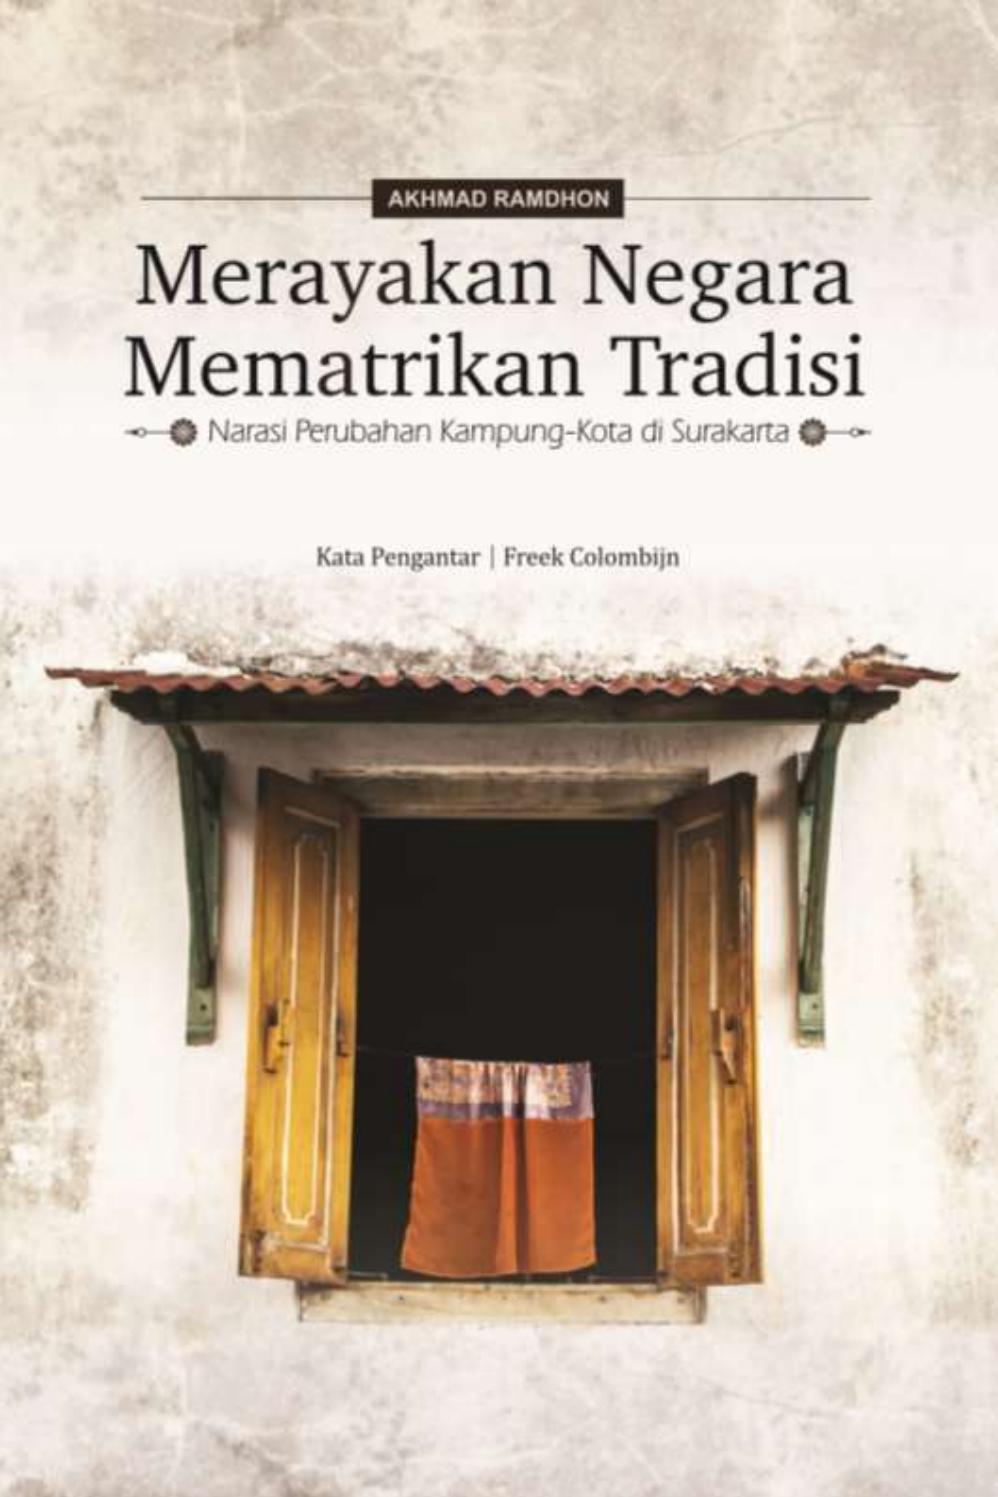 Merayakan Negara Mematrikan Tradisi By Kampungnesia Issuu